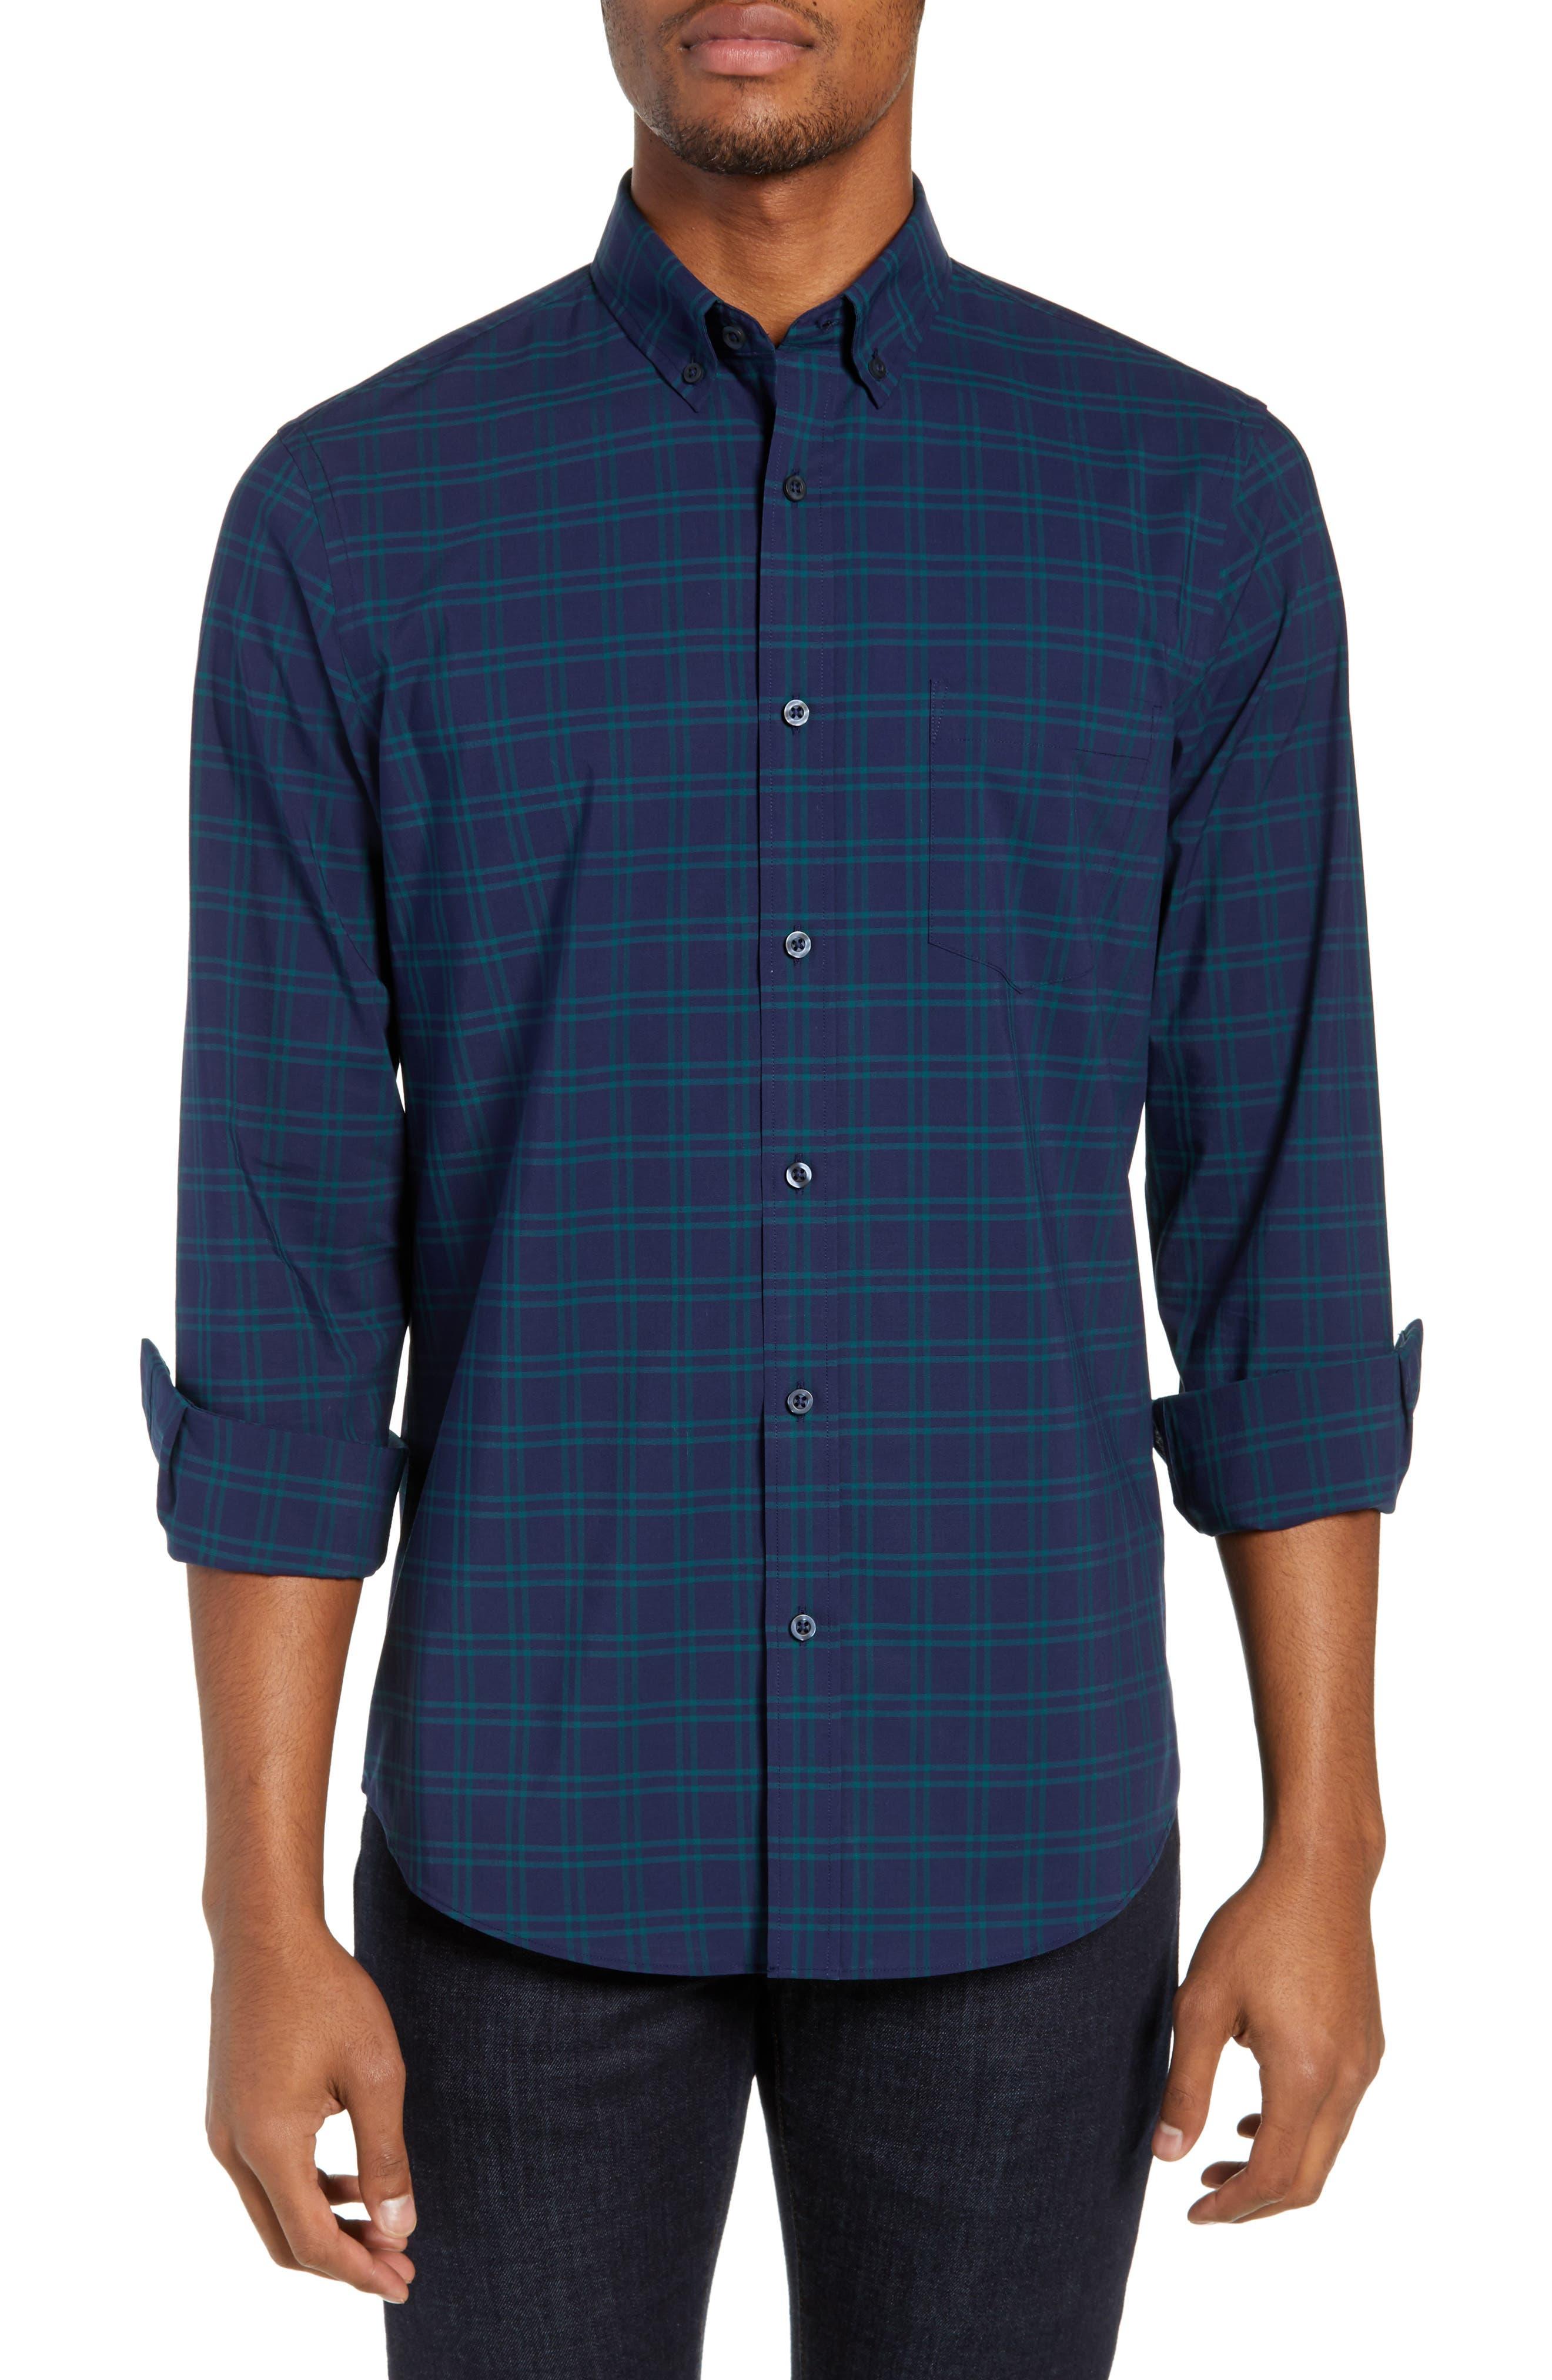 NORDSTROM MEN'S SHOP Tech-Smart Slim Fit Check Sport Shirt, Main, color, NAVY IRIS TEAL WINDOWPANE